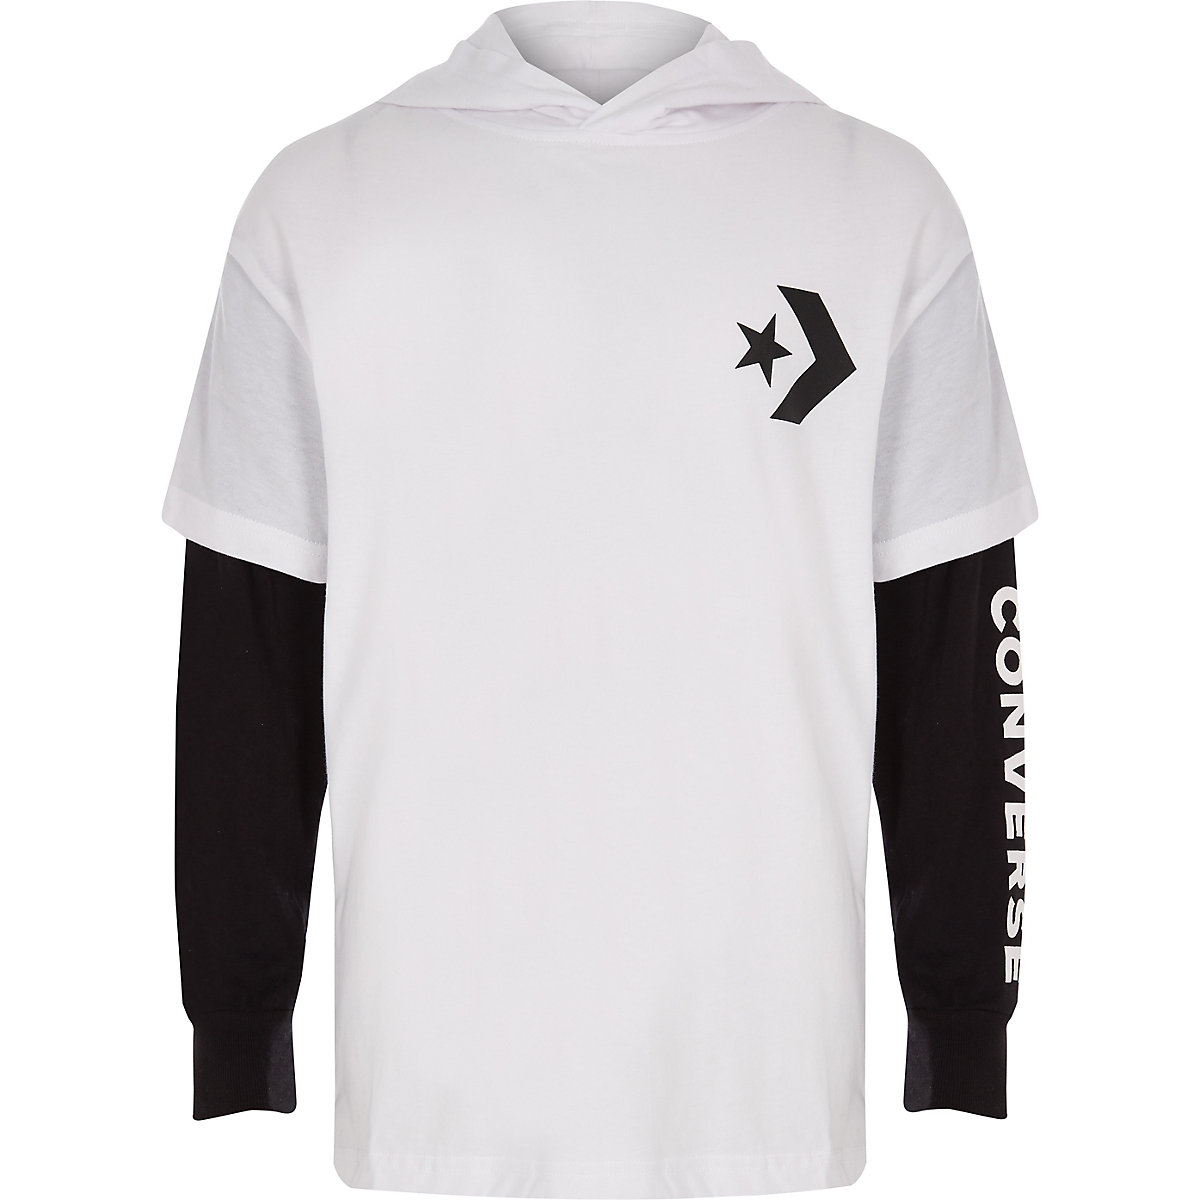 Boys Converse white hooded T-shirt